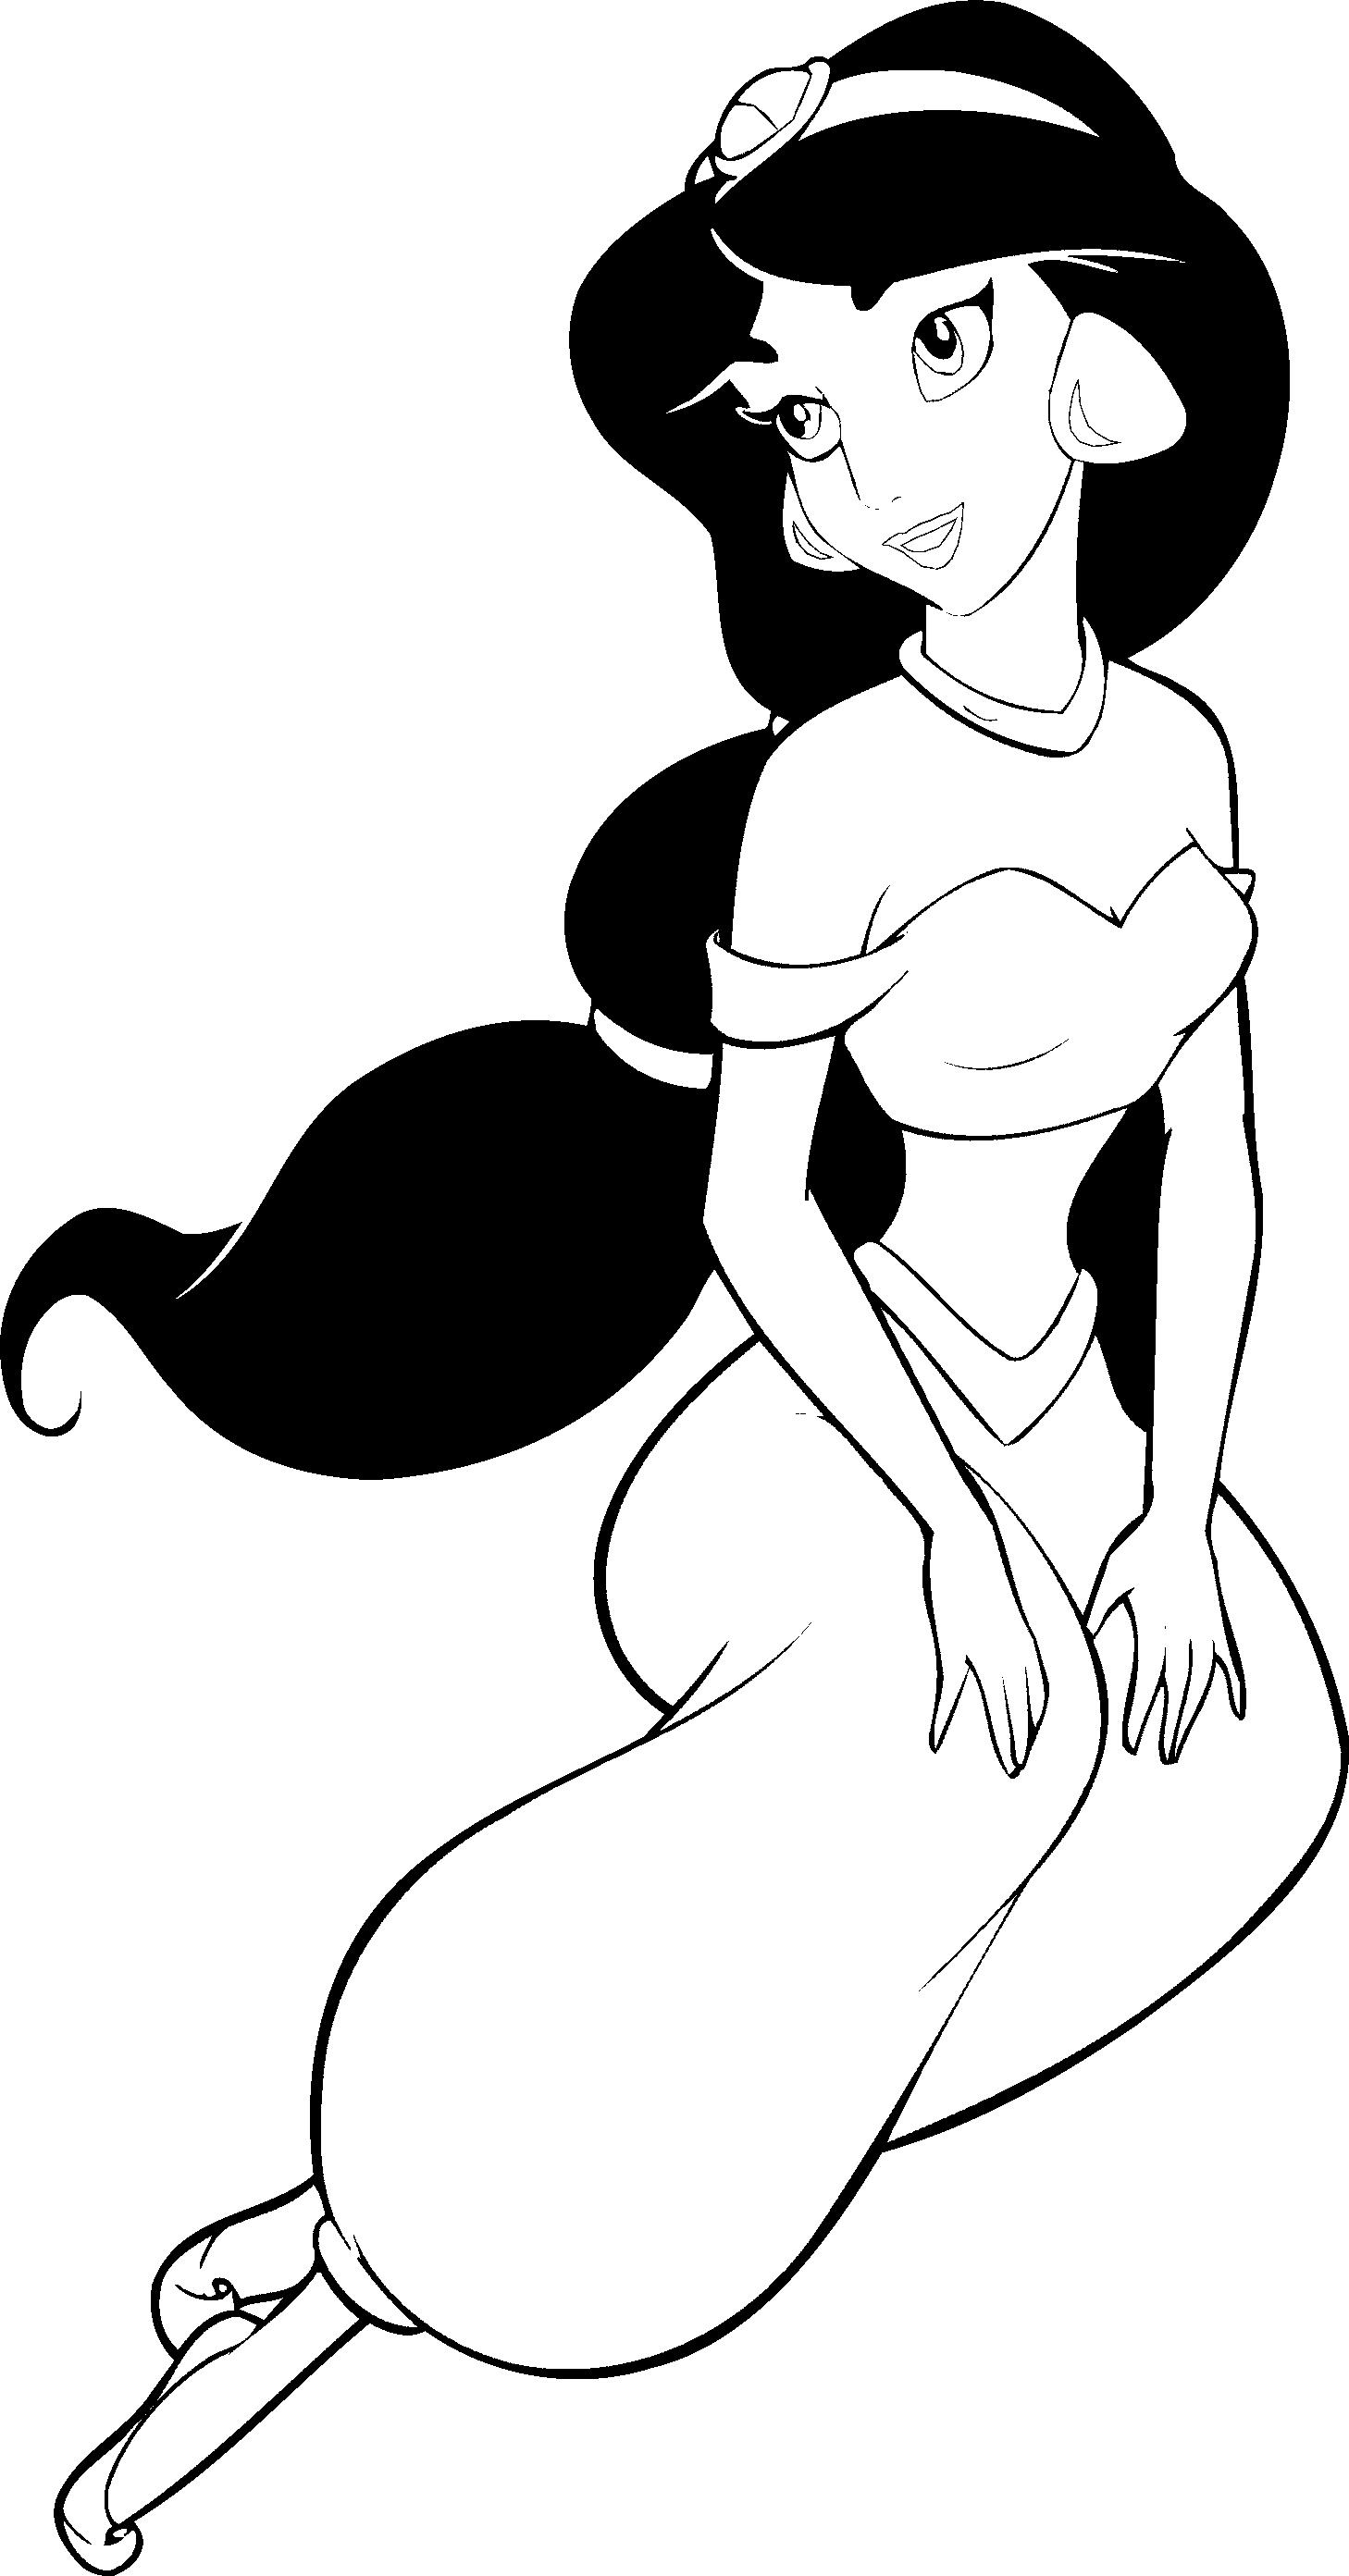 Co coloring books game - Co Coloring Sheet Disney Princess Symbols Sylvia S Thoughts